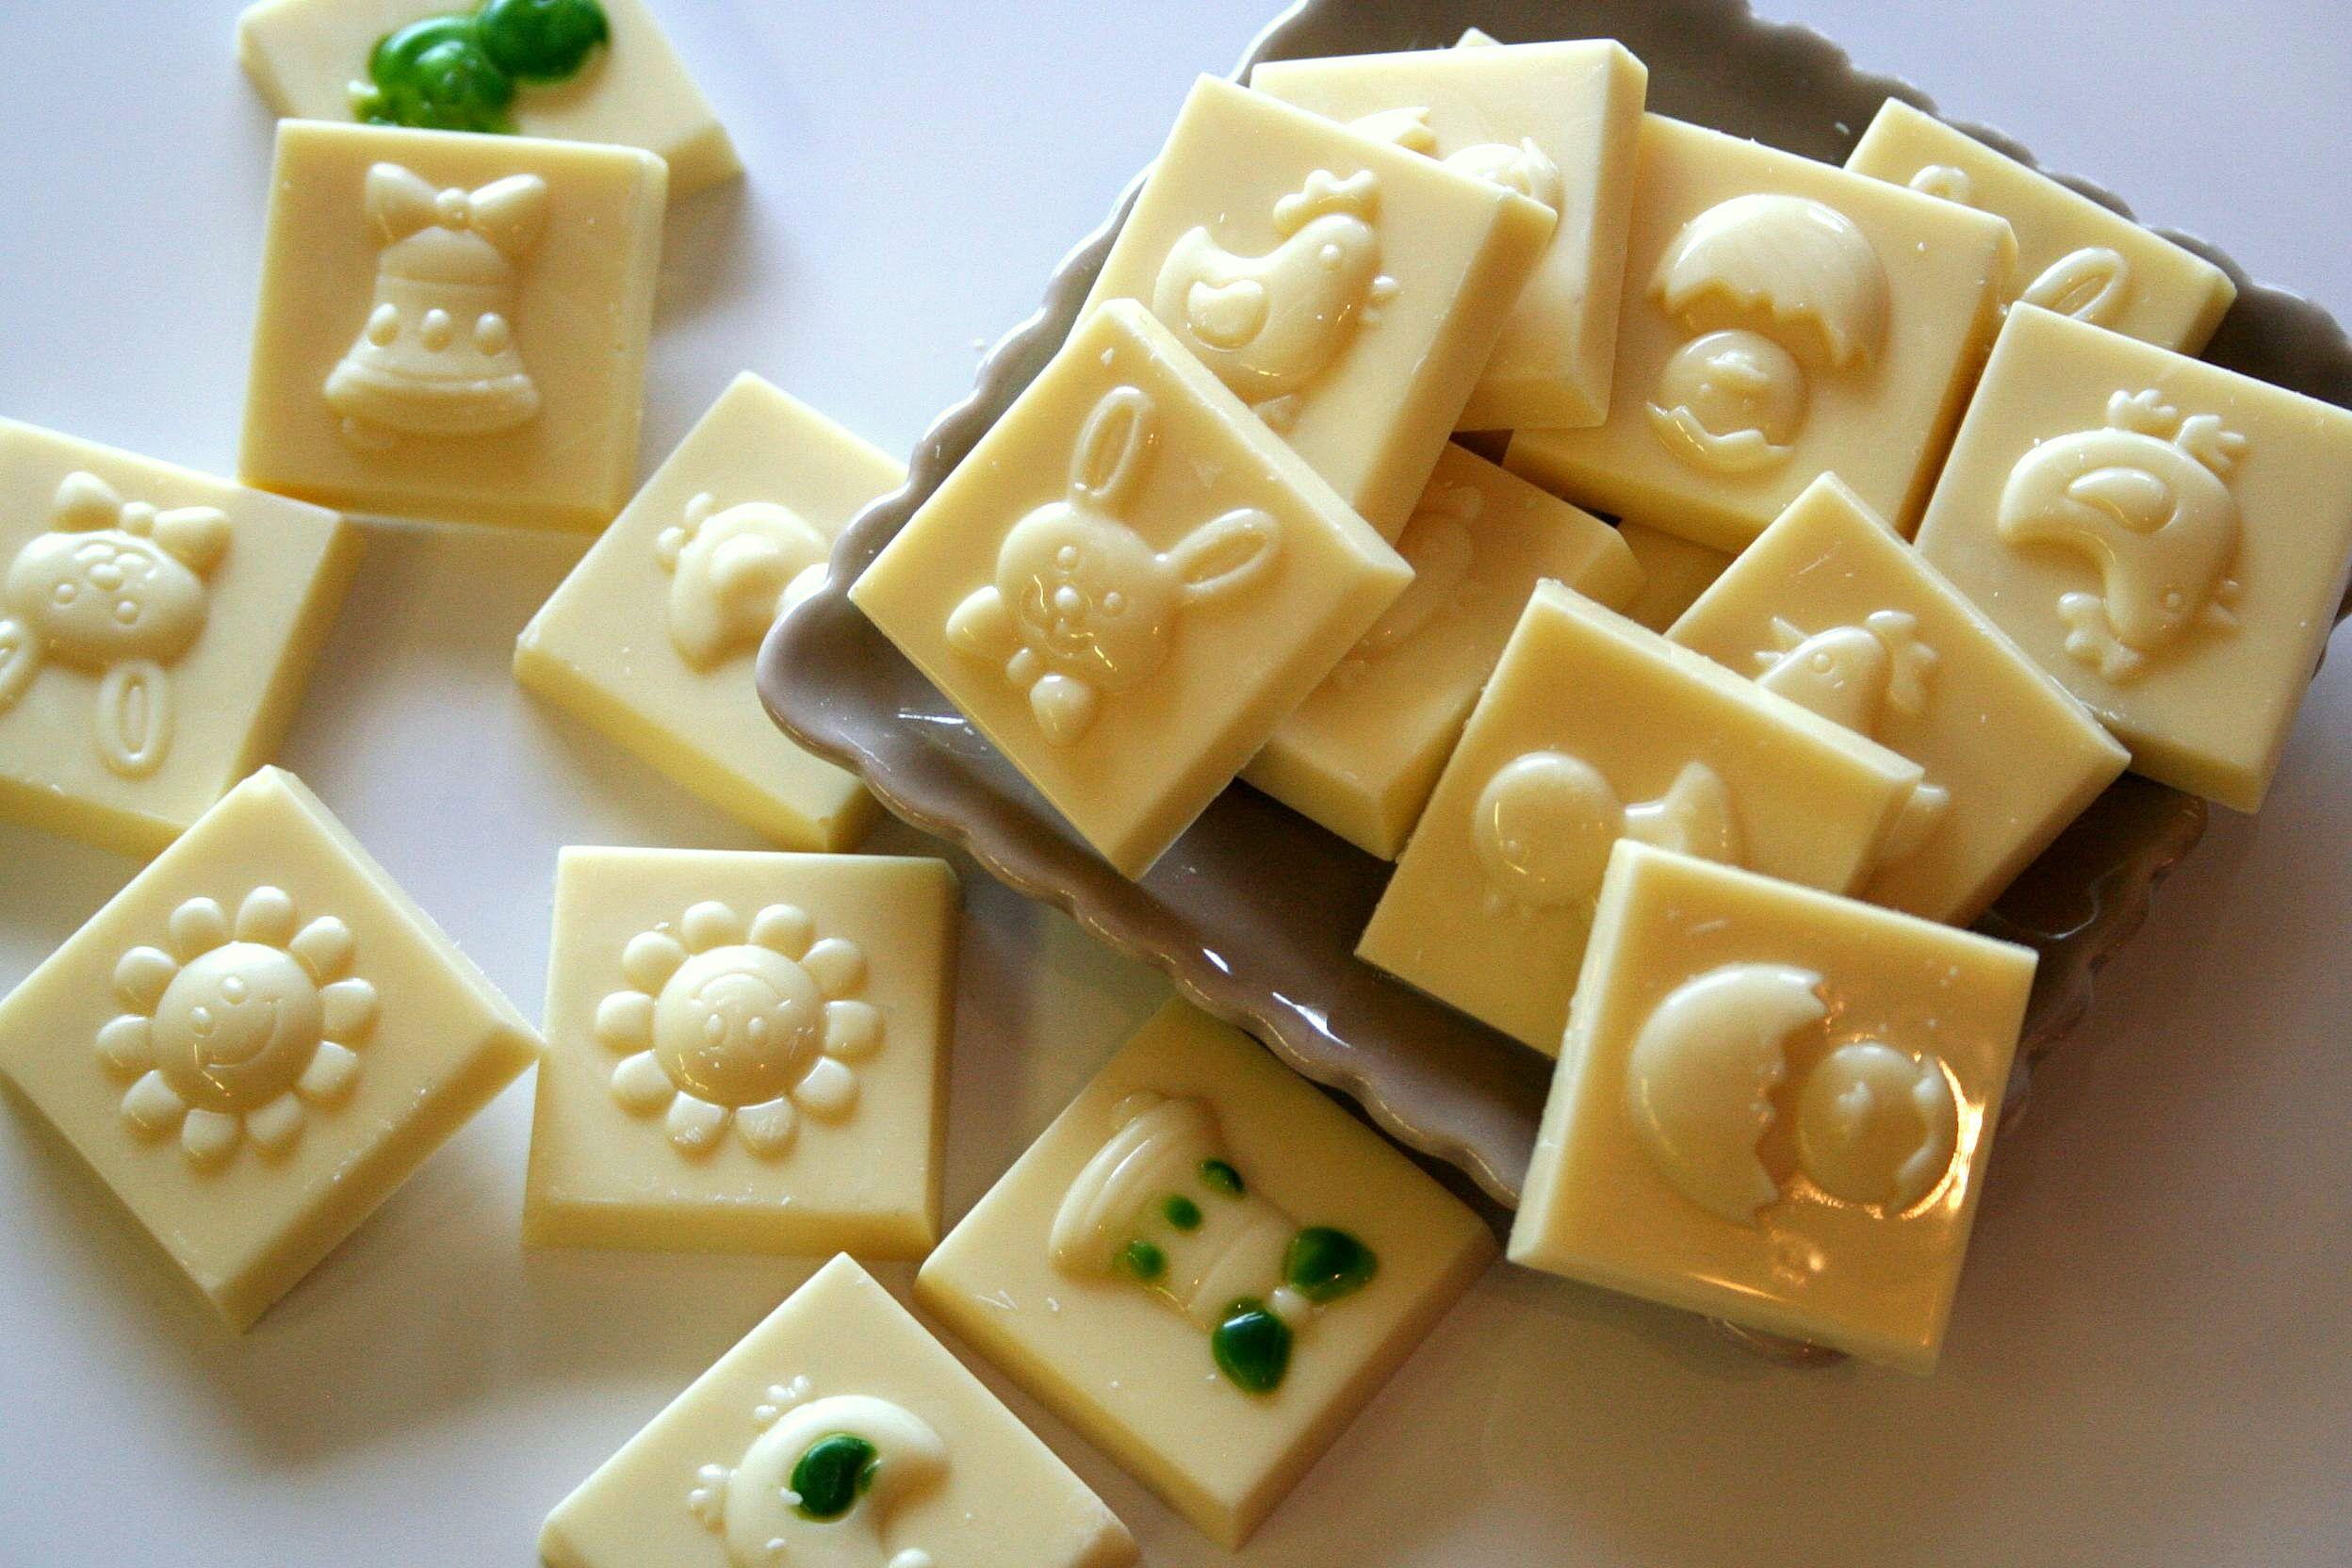 Oeufs En Chocolat Brillants Grace Au Mycryo